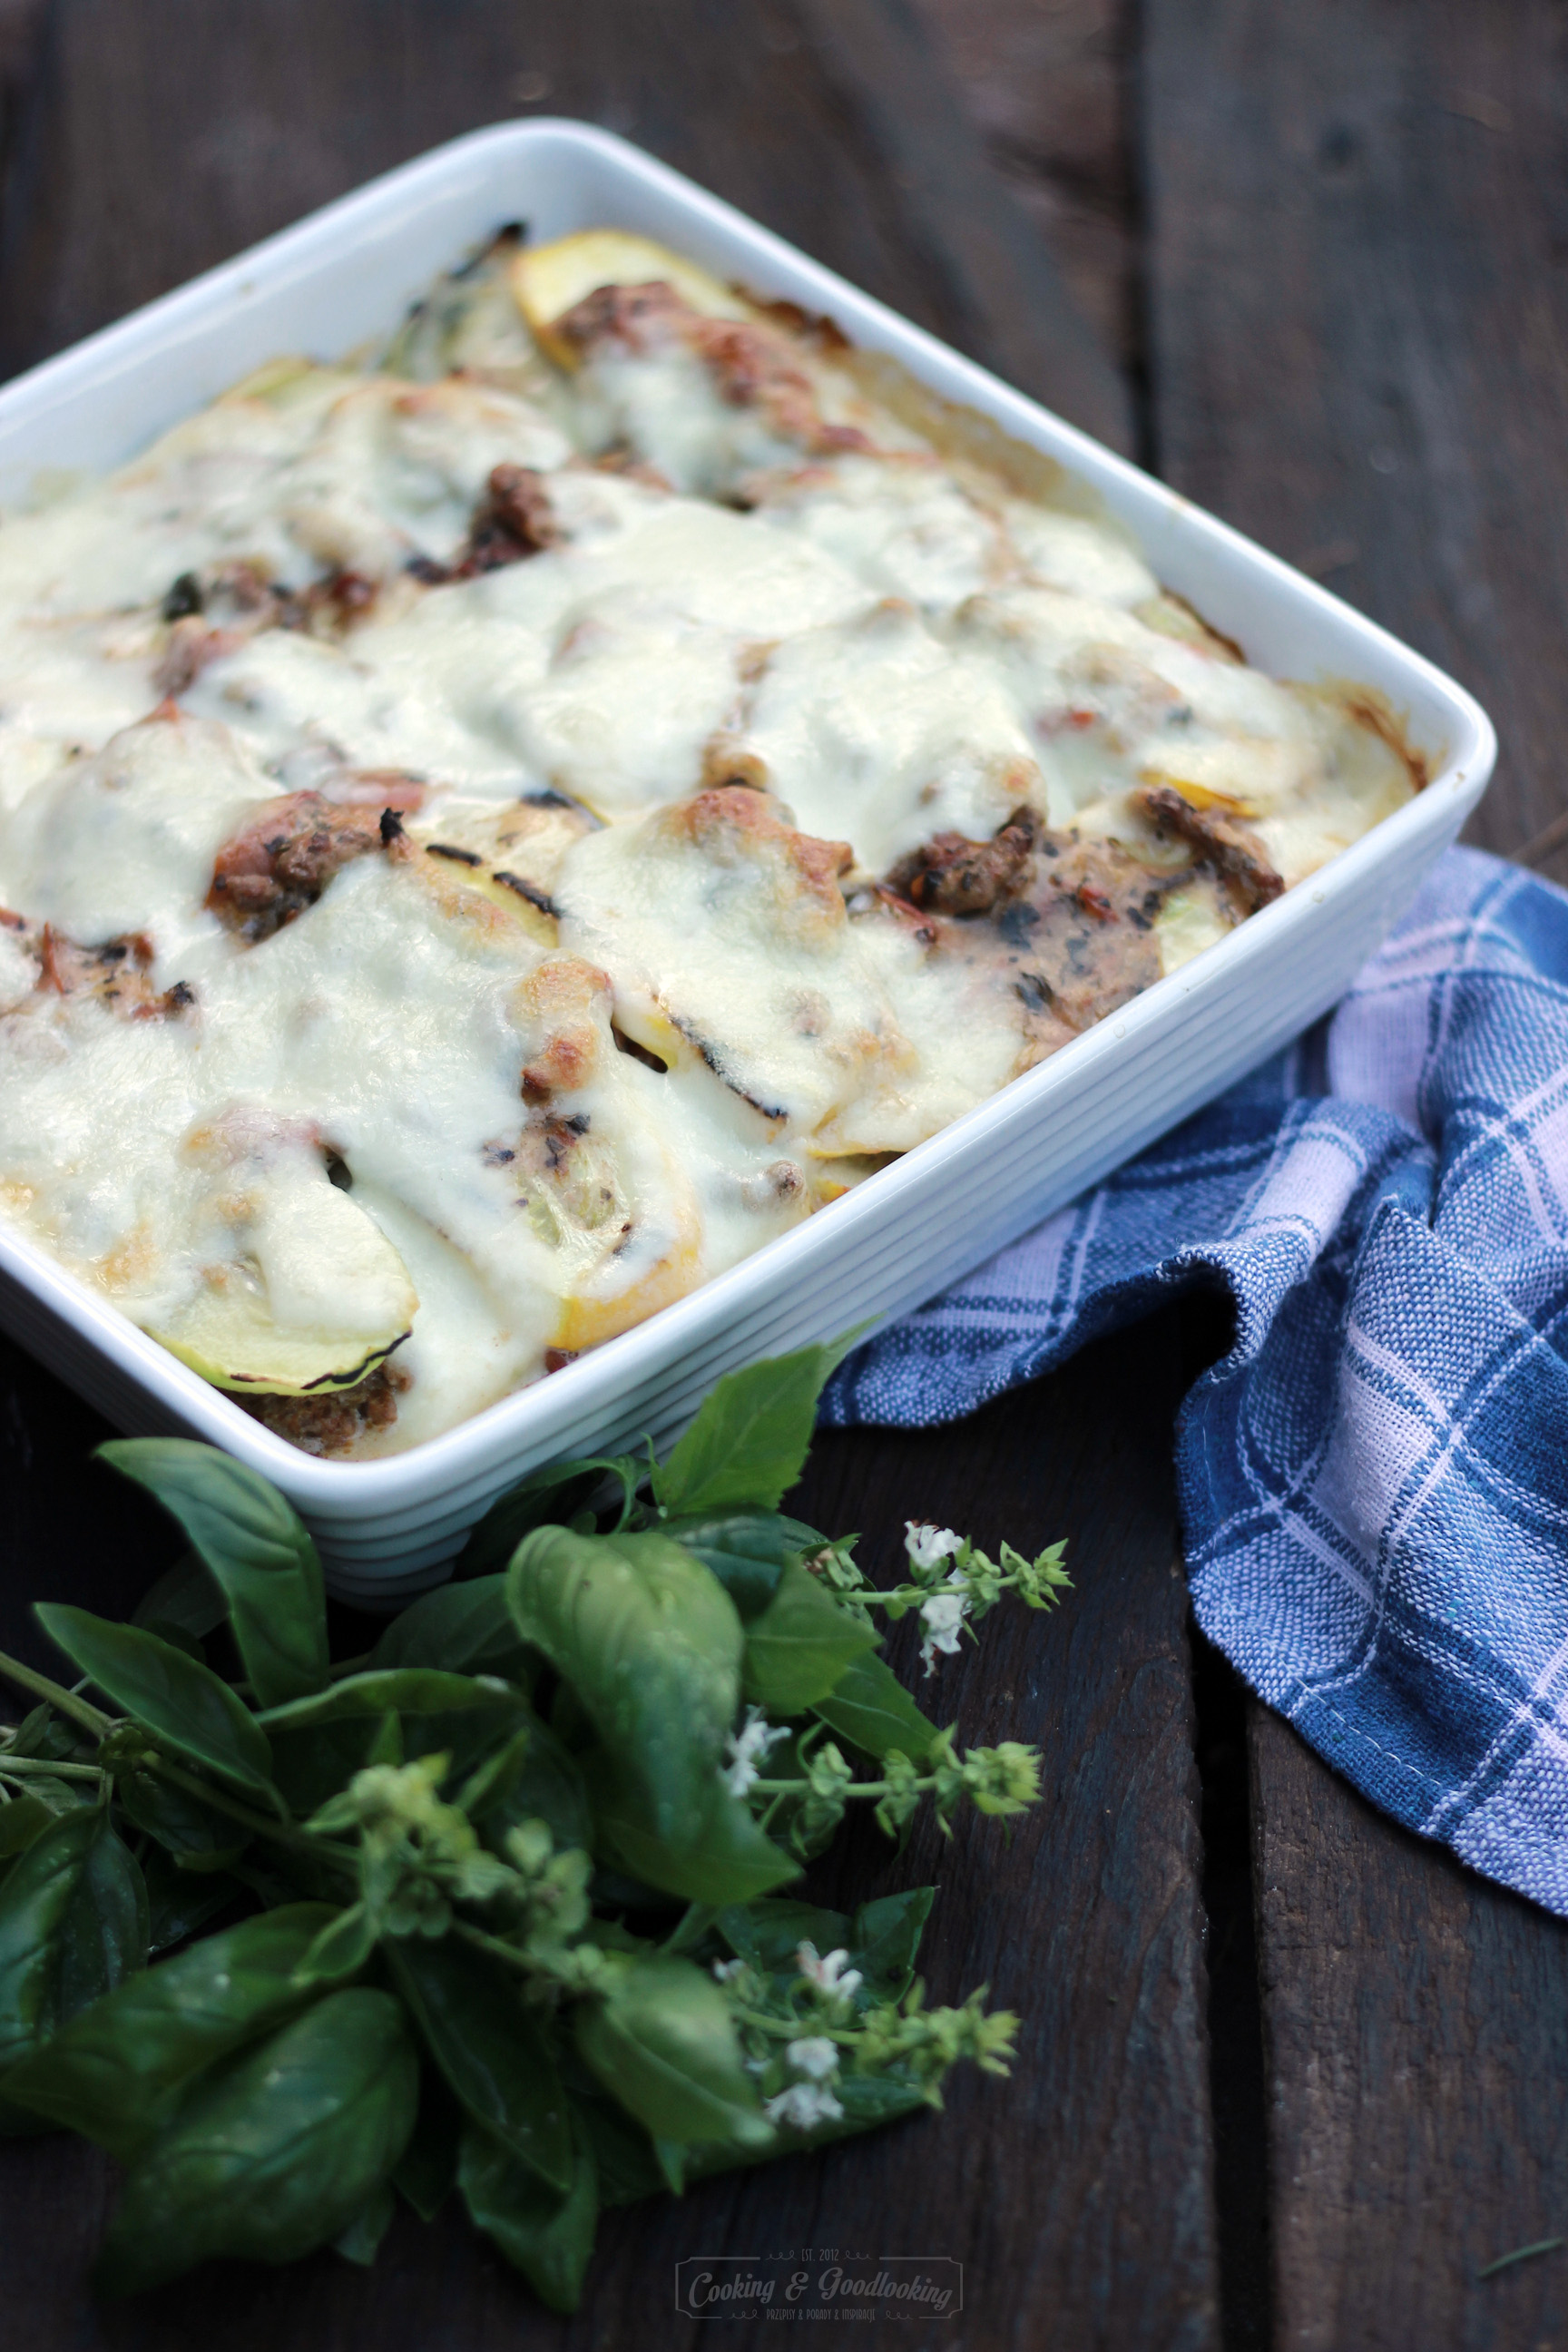 Lekkie lasagne z cukinii bez makaronu/Light zuccinni lasagne no pasta